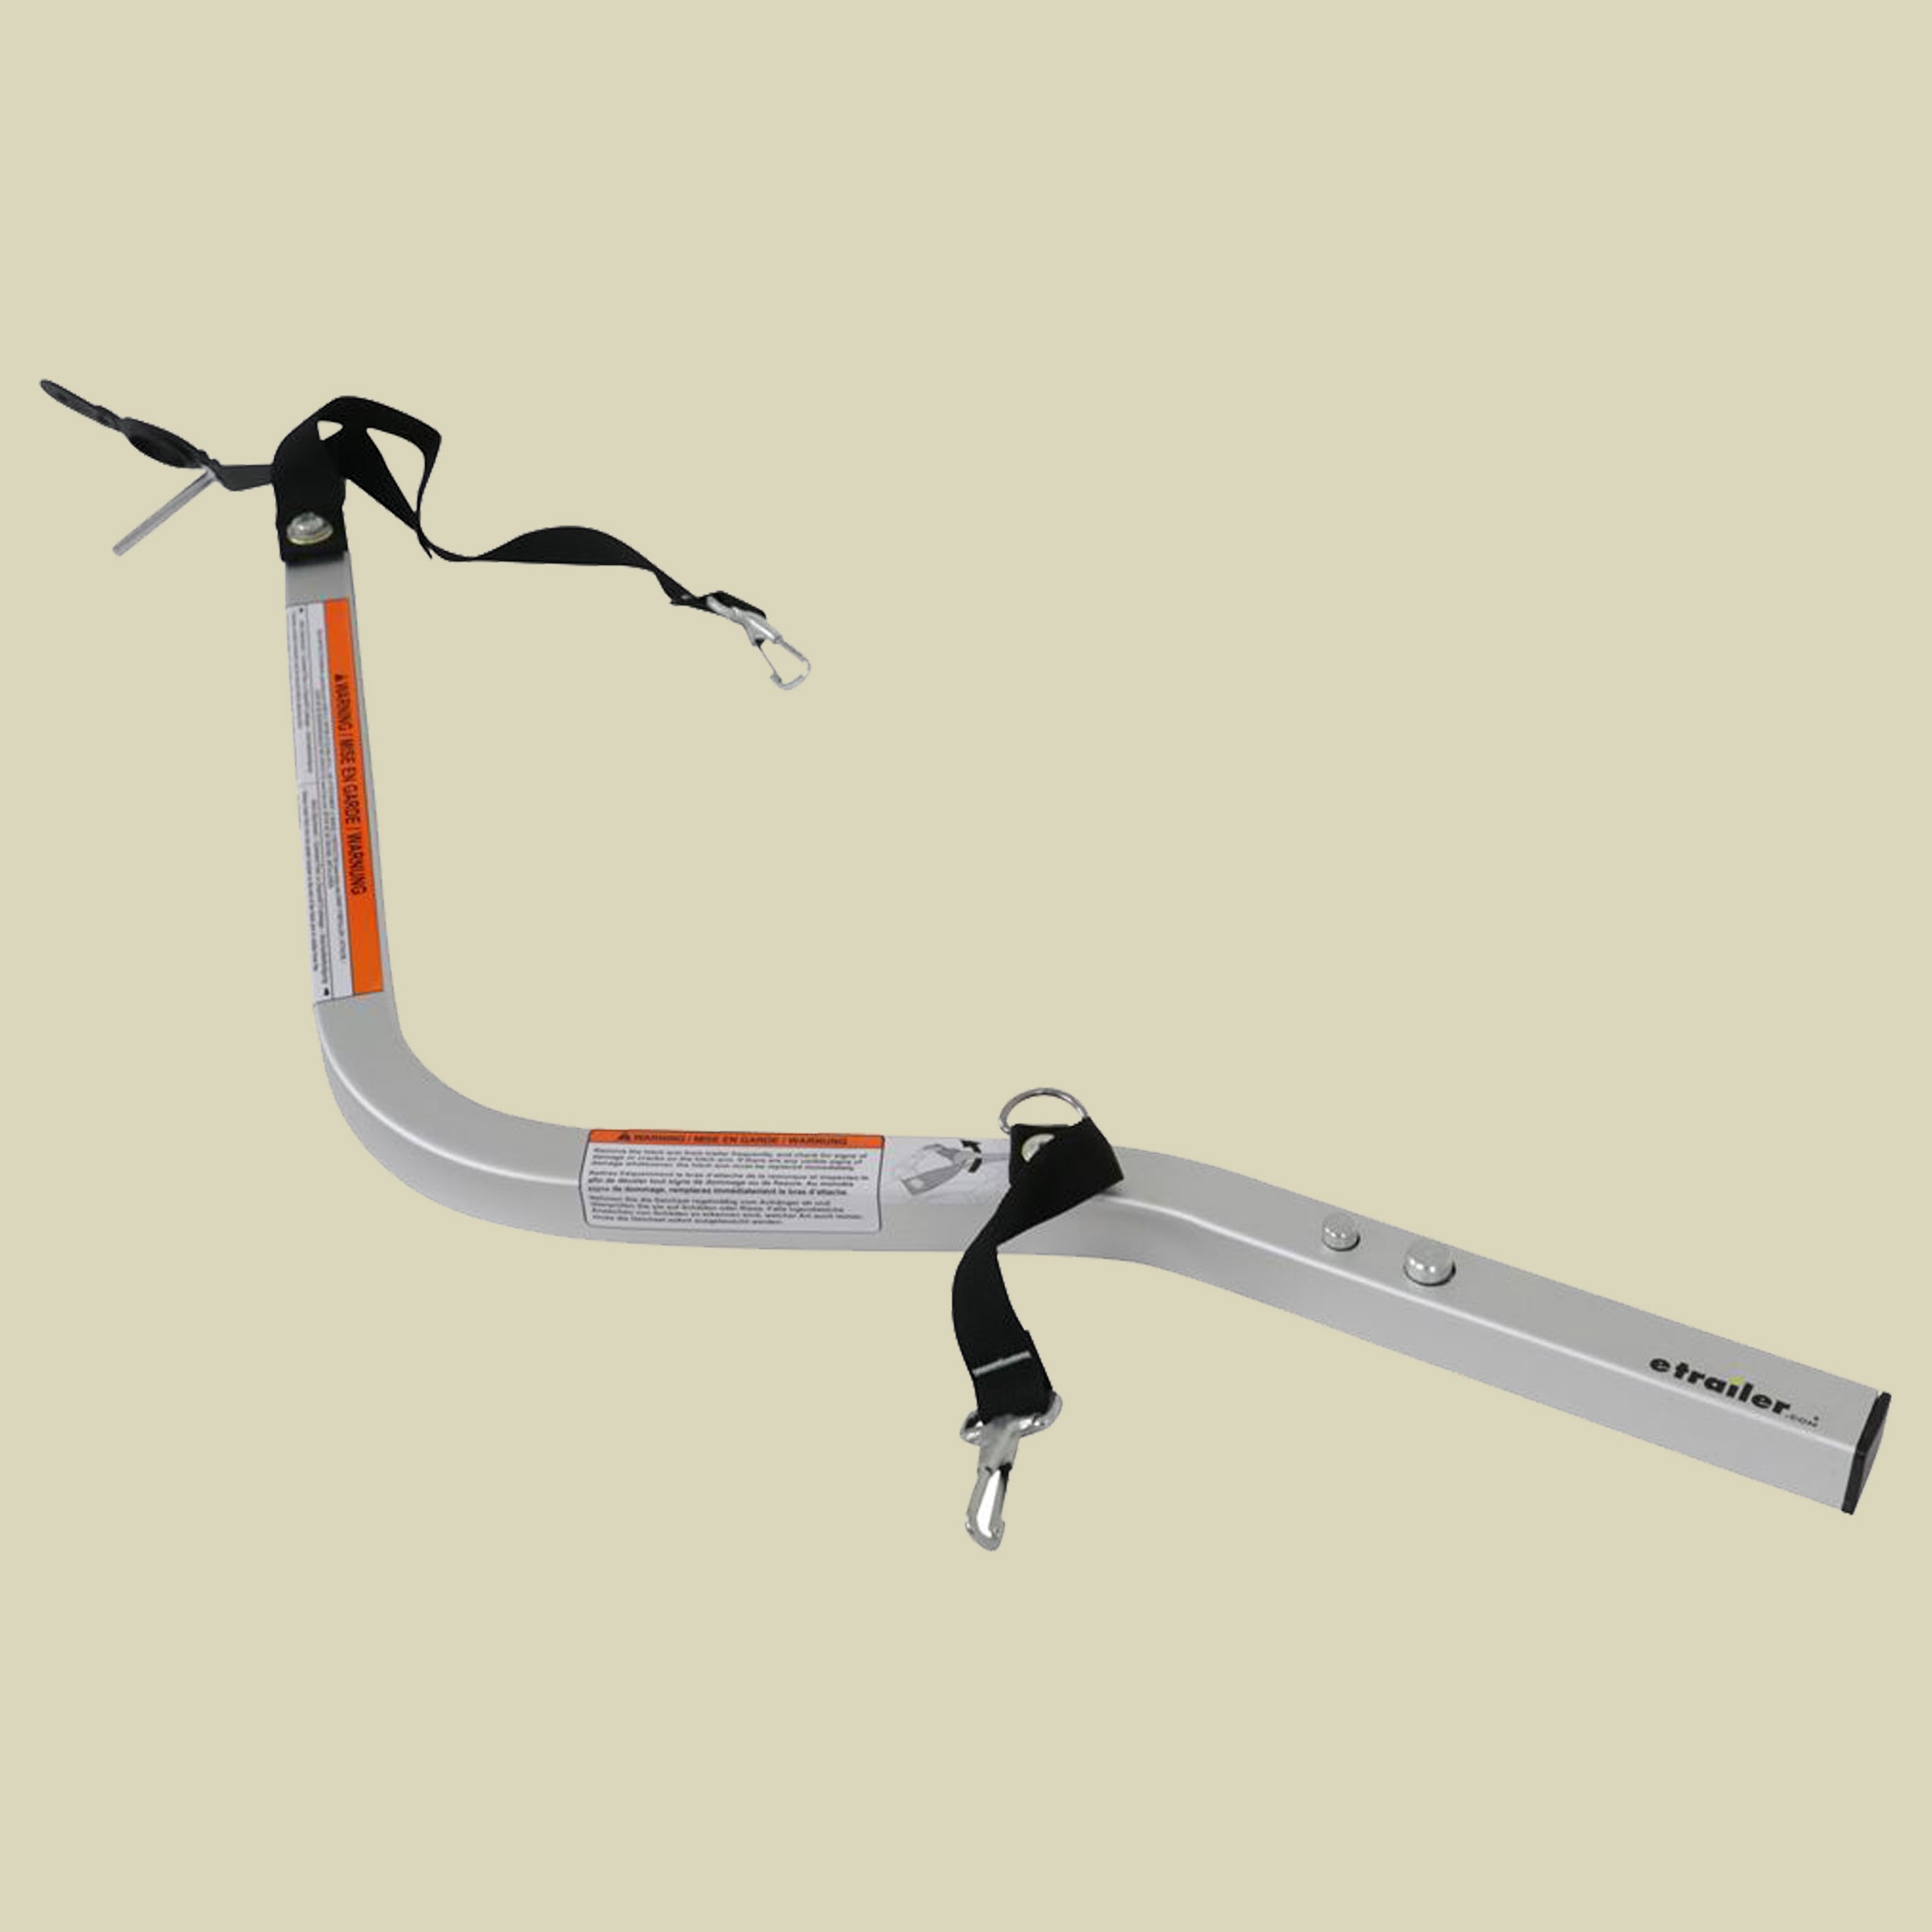 Thule, Hitch Arm Assy-BikeTrailerKit, Zubehör Kindertransporter Thule